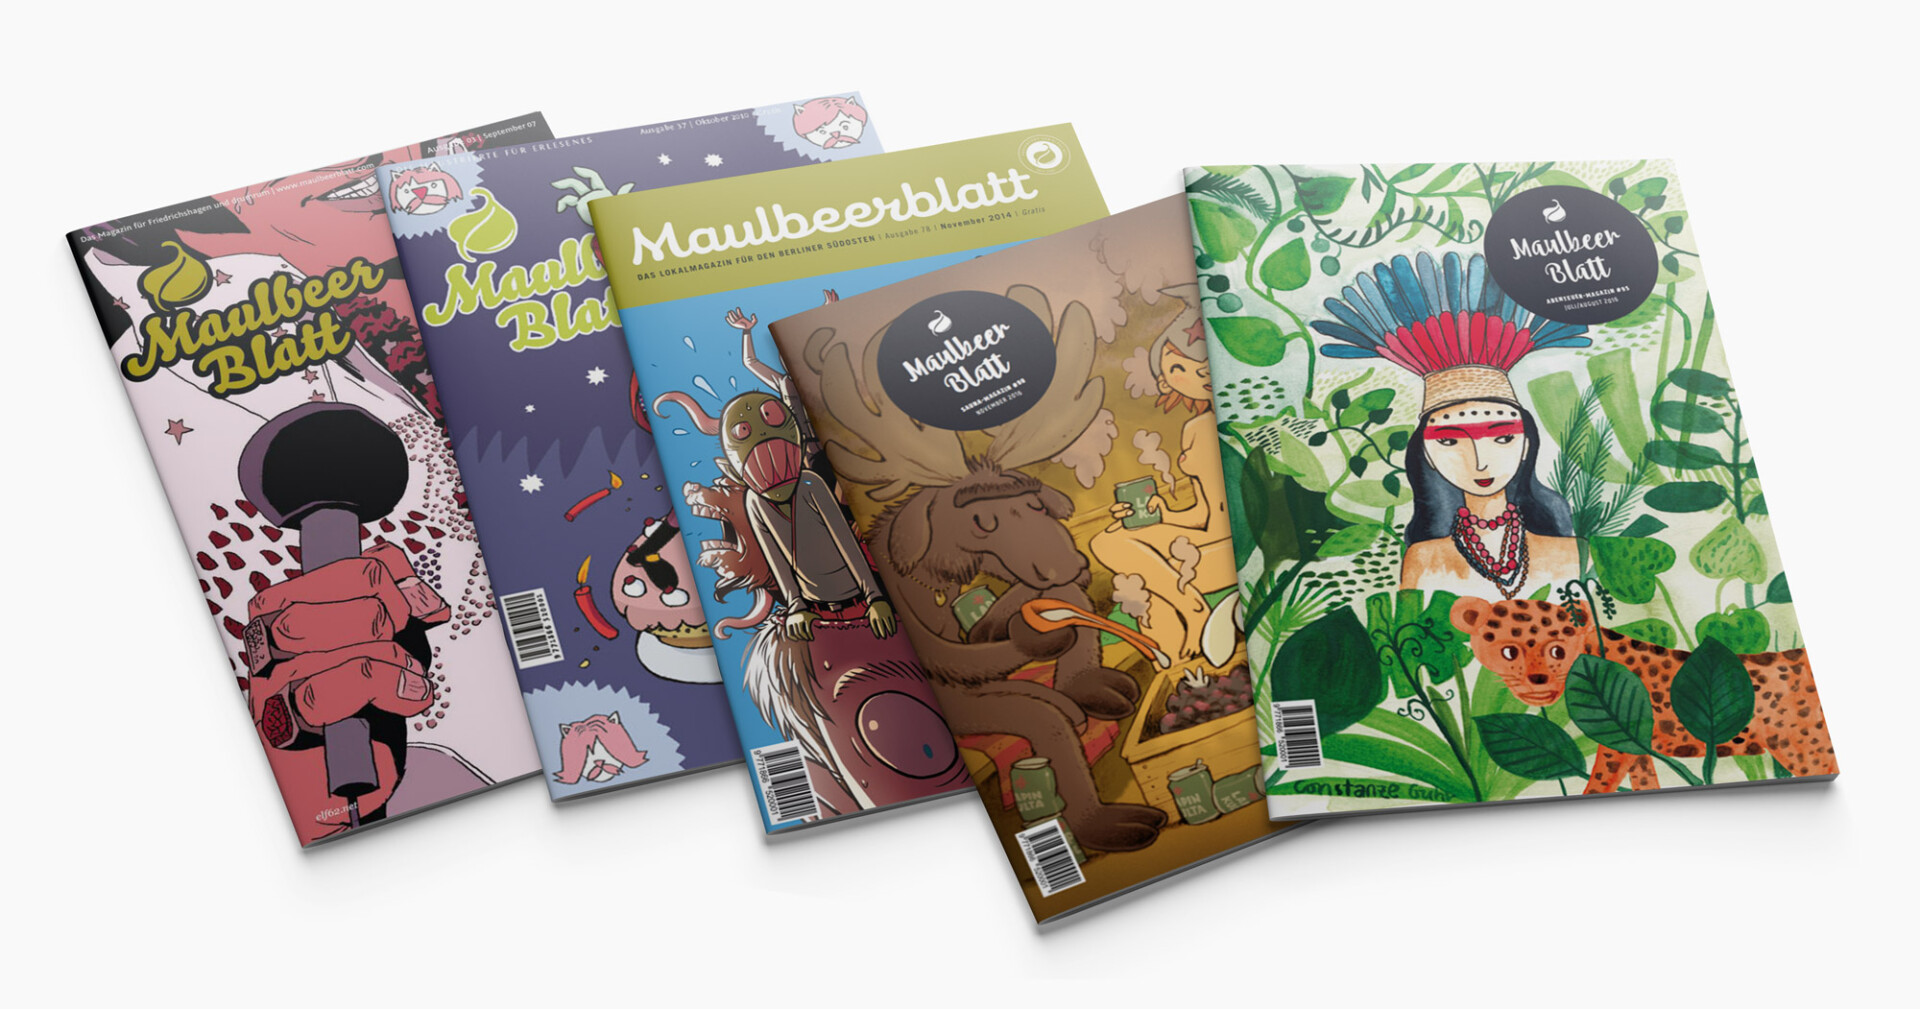 print magazin kultur berlin friedrichshagen